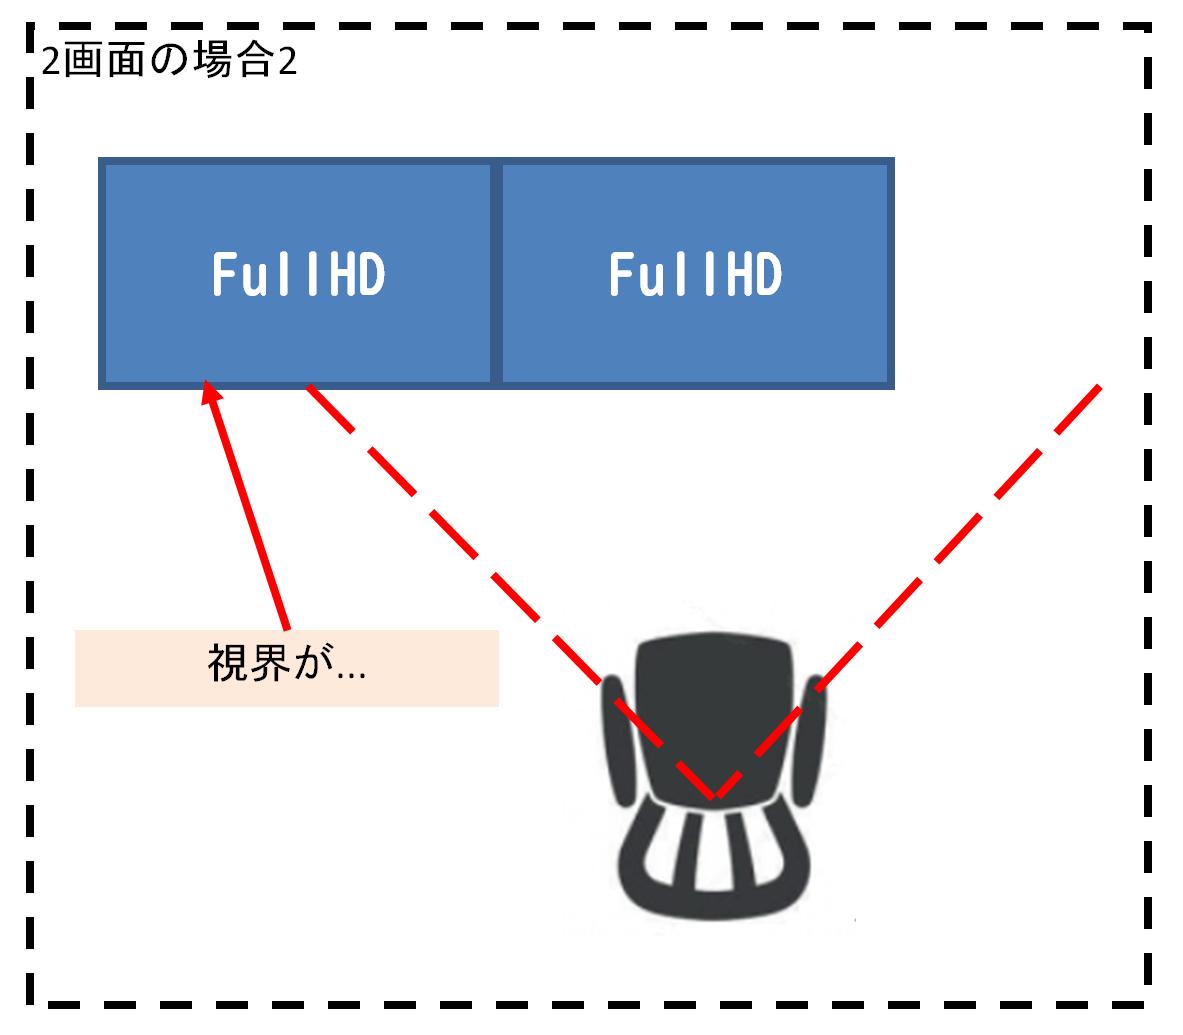 f:id:Kotori-ChunChun:20190429171636p:plain